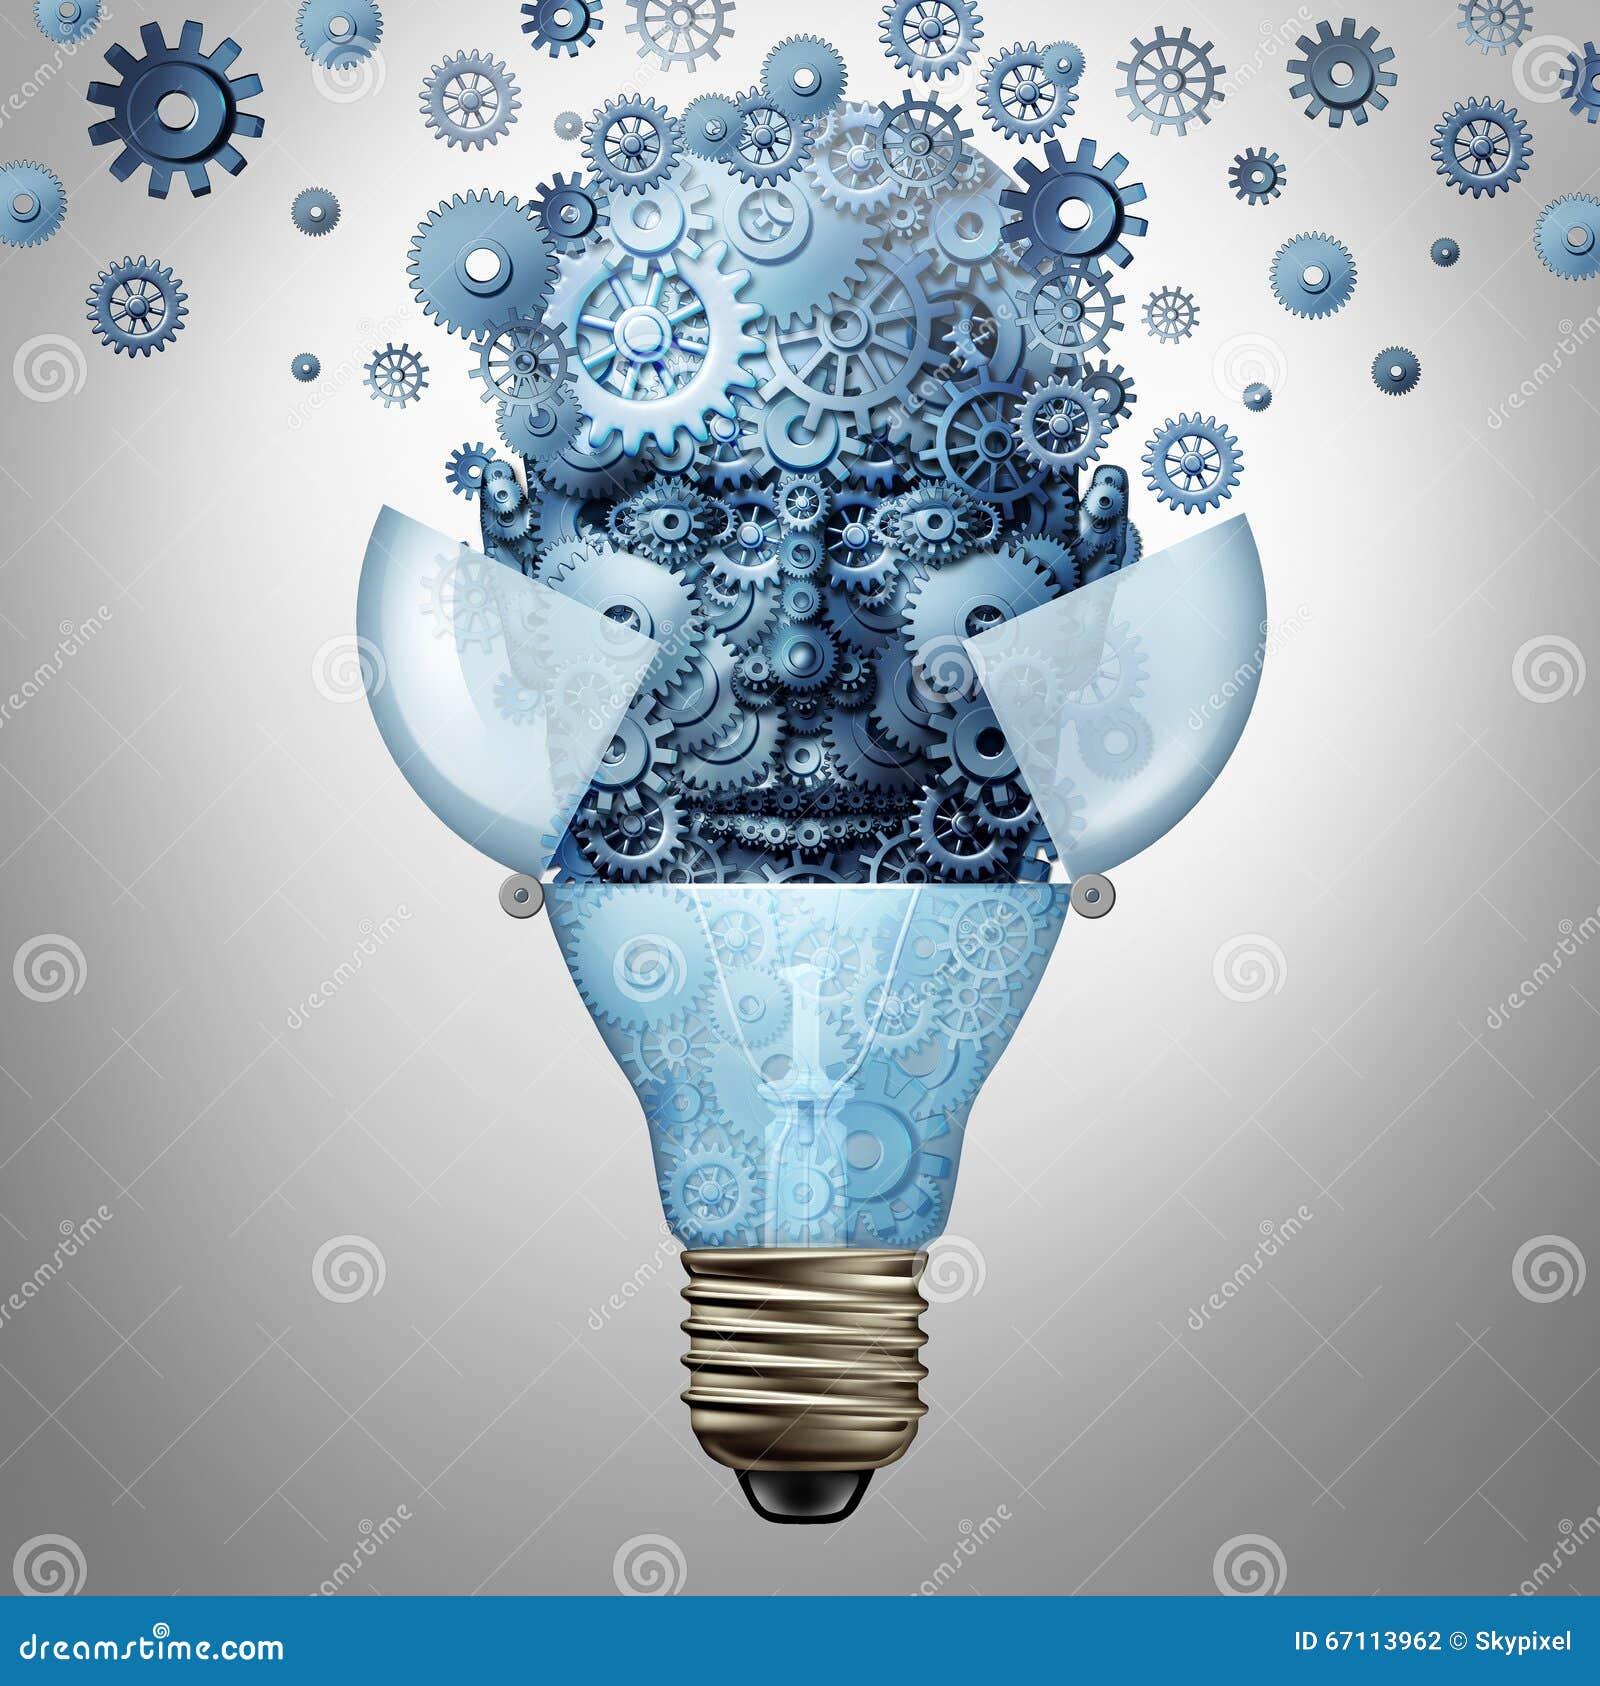 Artificial Intelligence Ideas